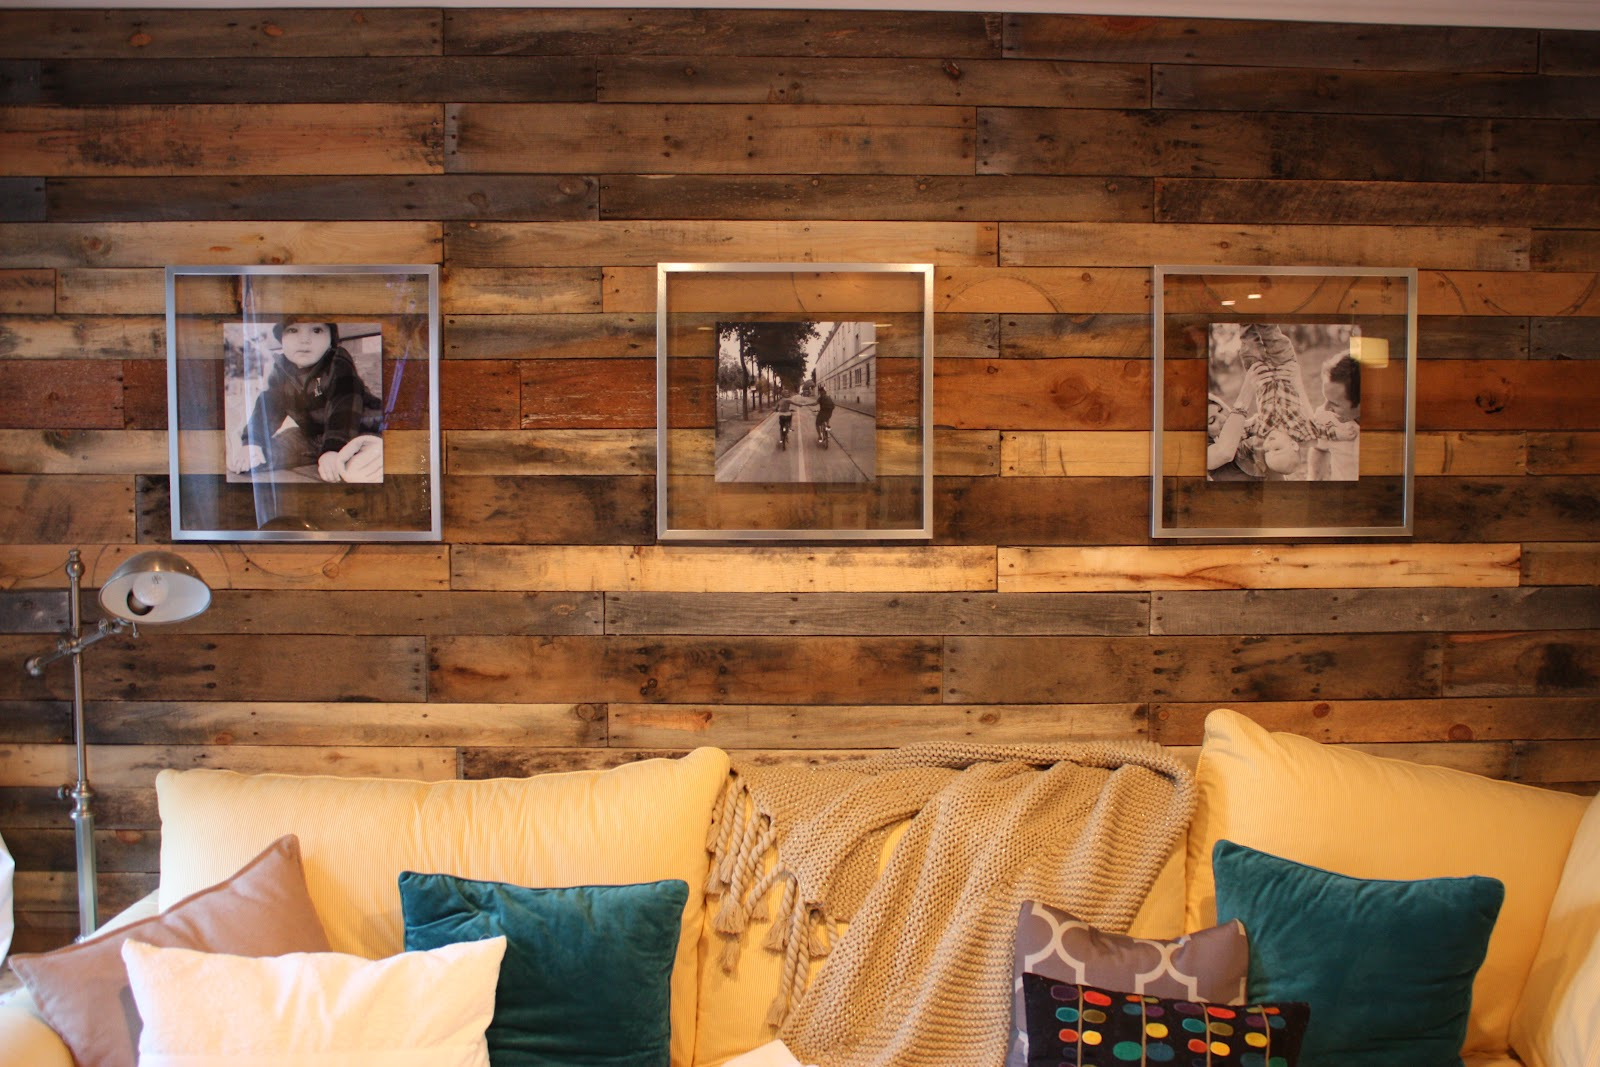 A fashion gal a fireman wonder wall - Wall designs with wood ...